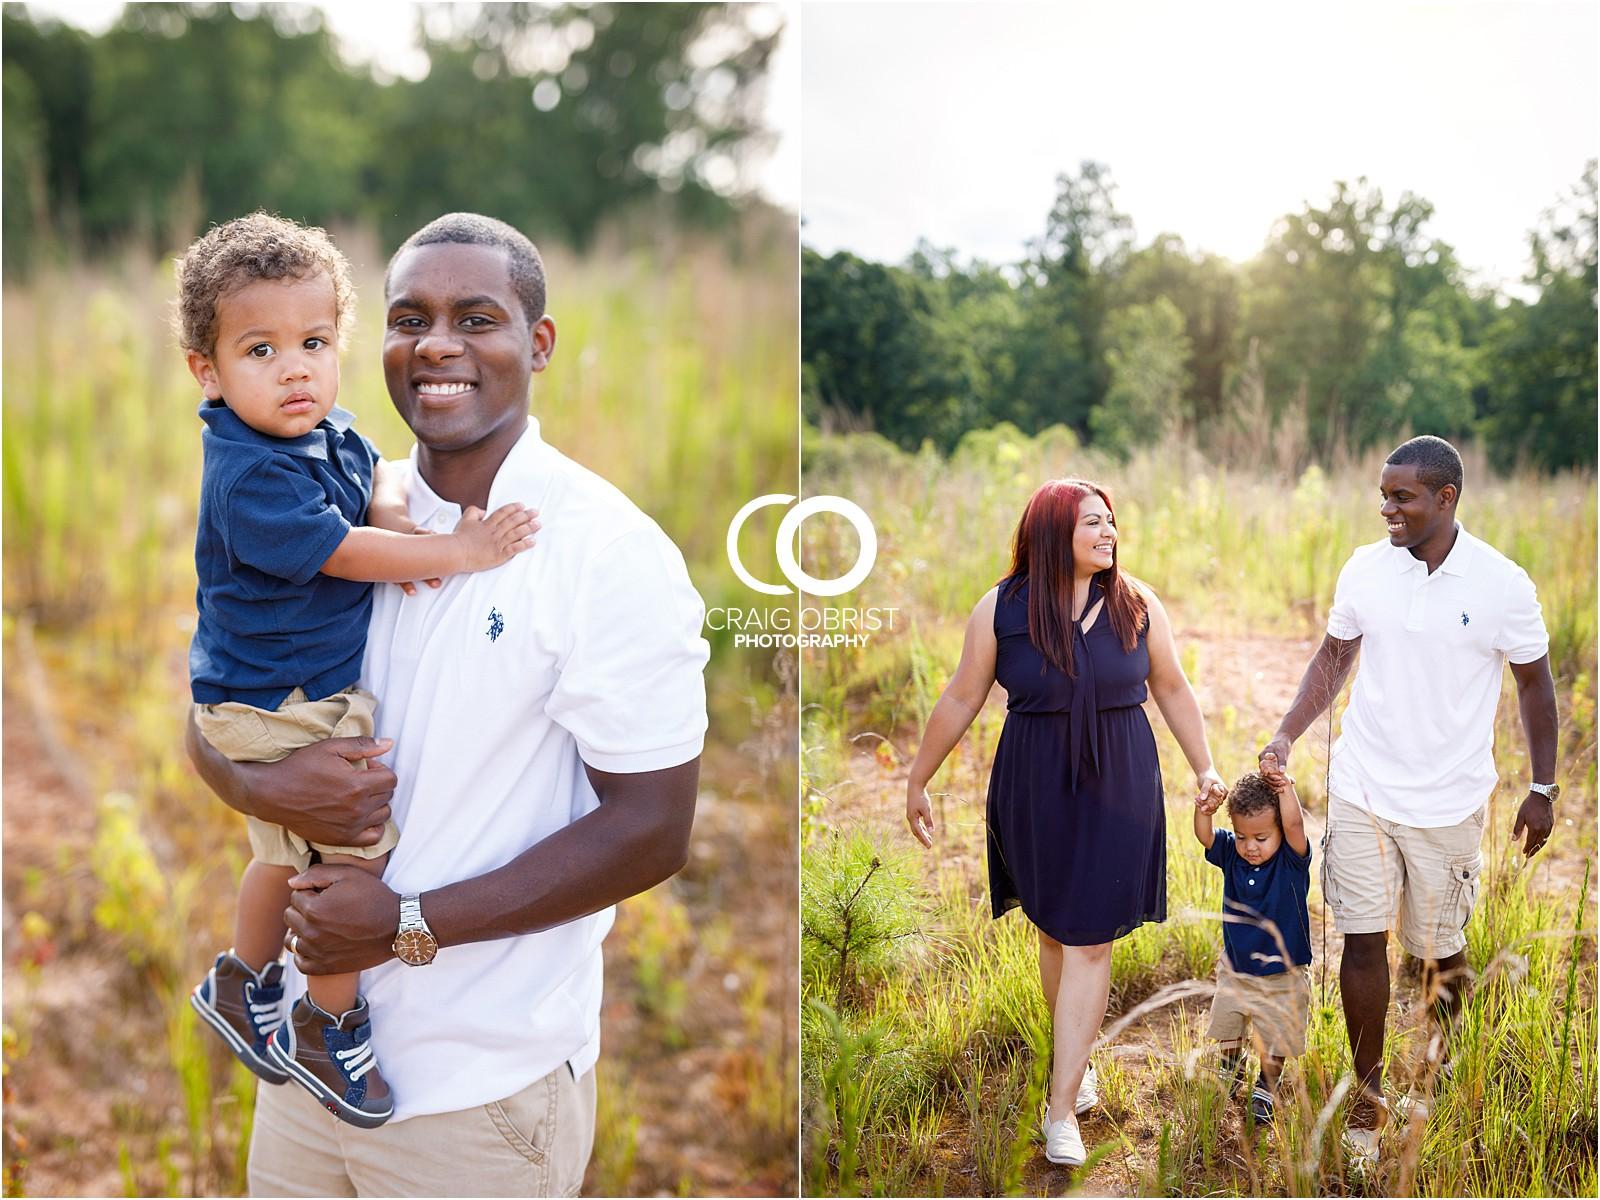 Grass Field Family Portratis Sunset Atlanta_0001.jpg